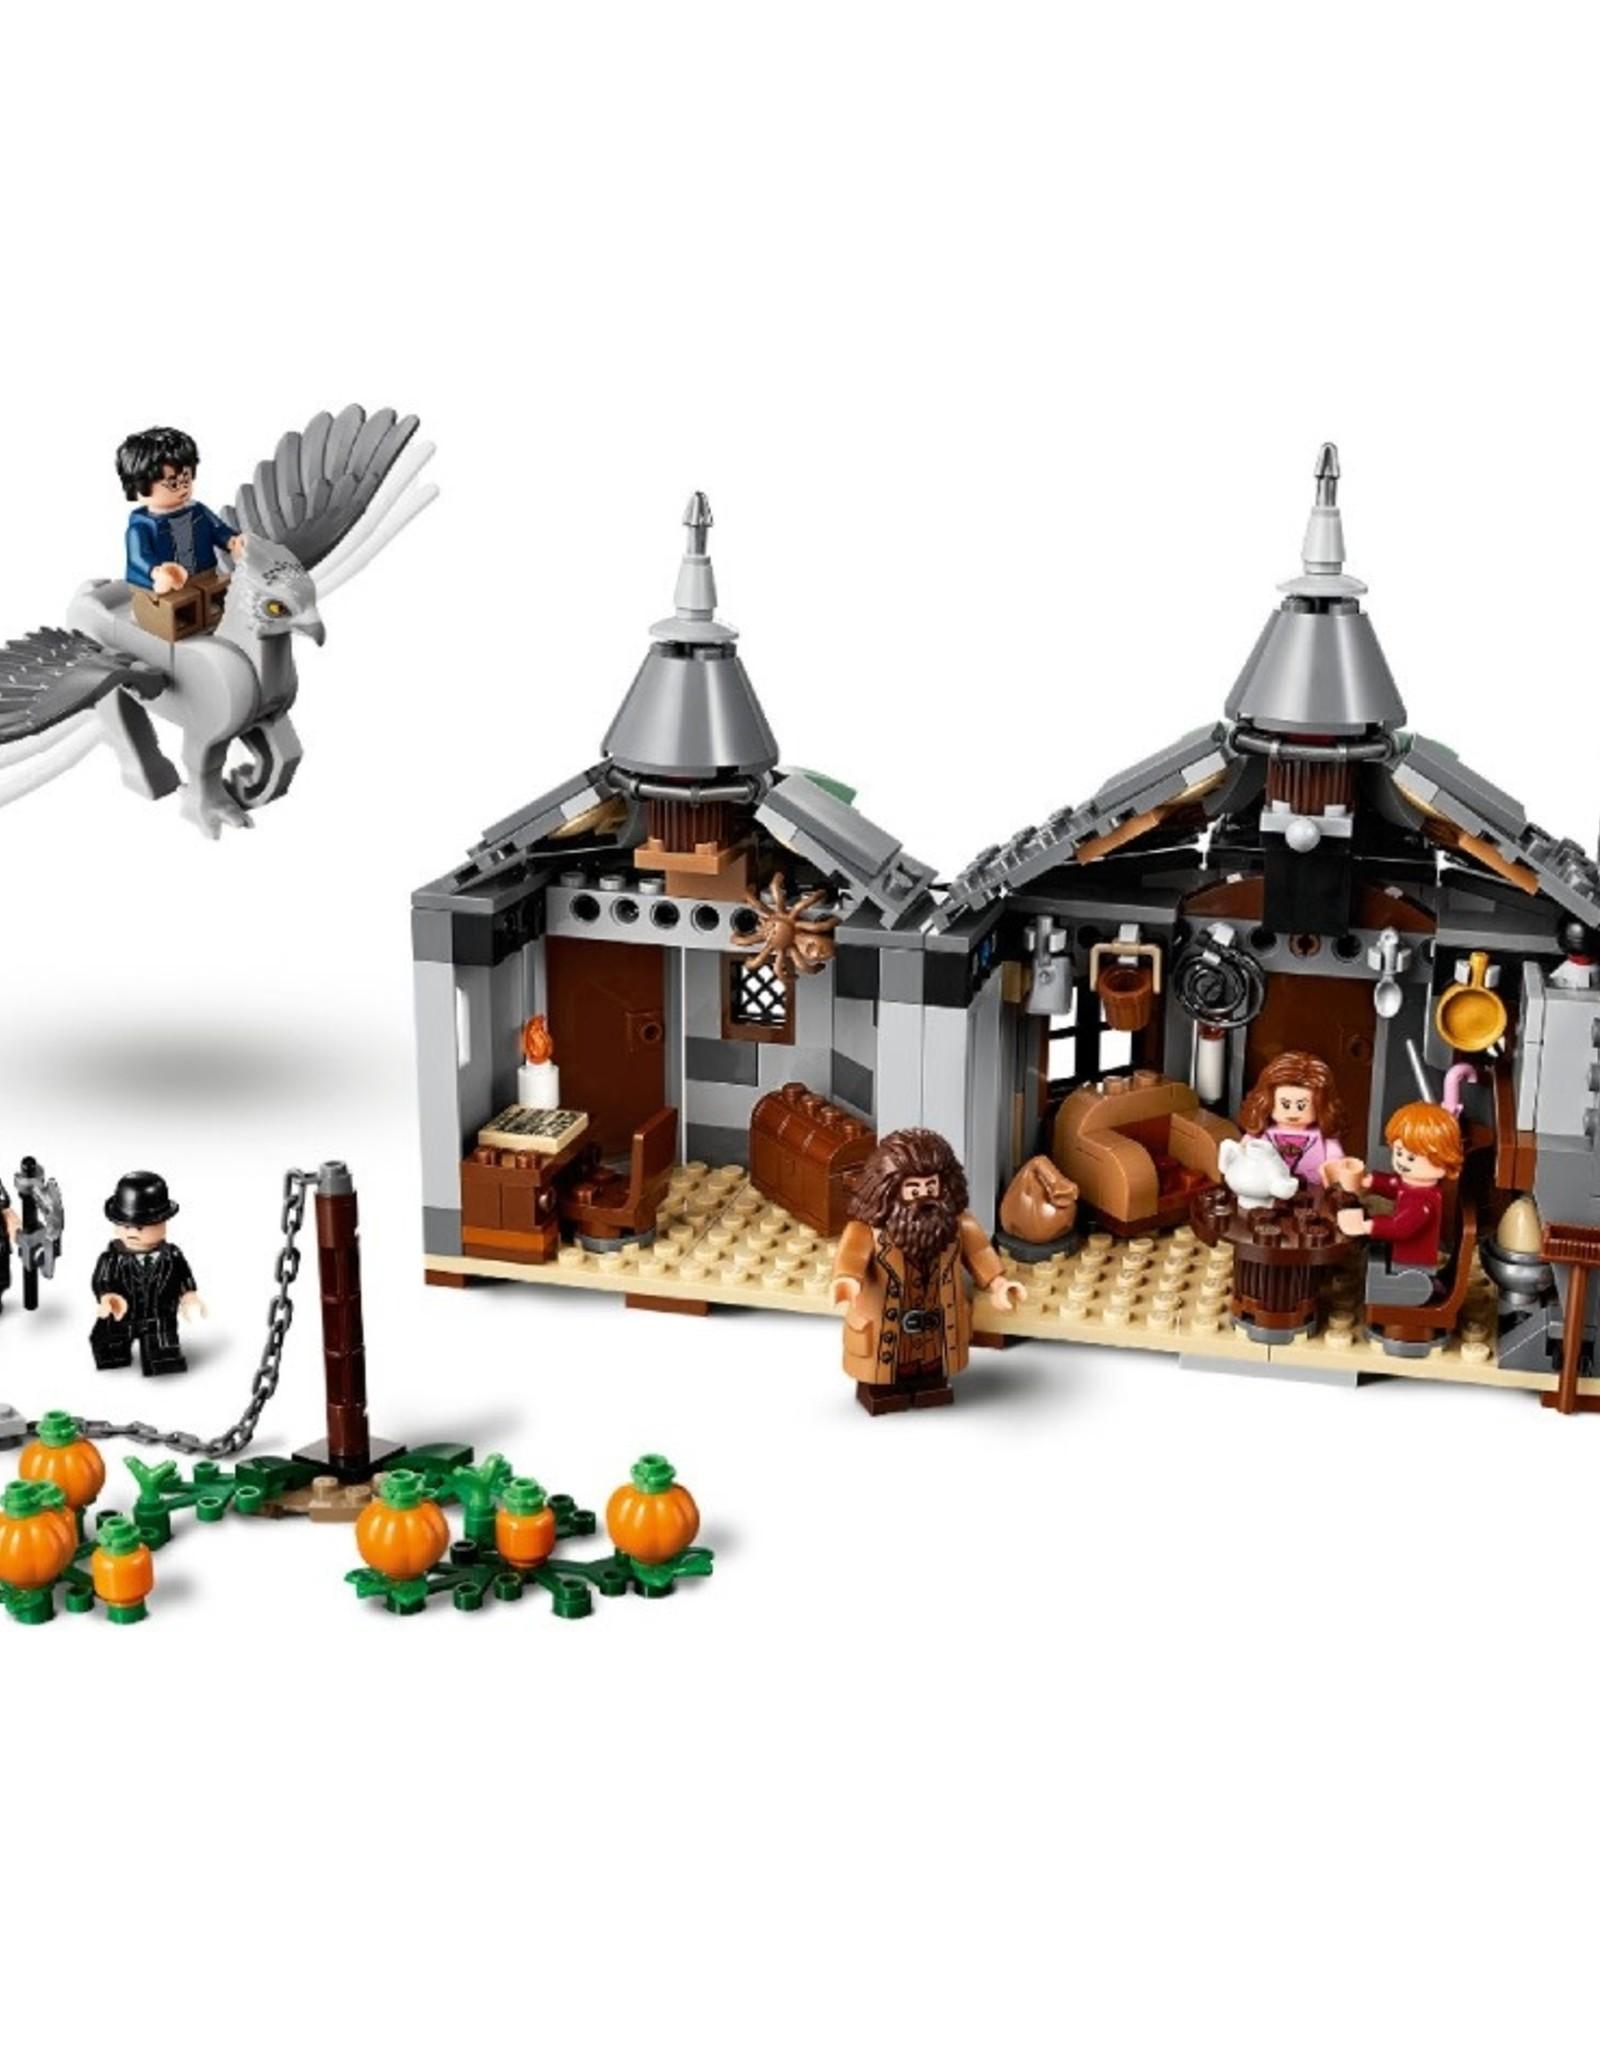 Harry Potter Hagrid's Hut: Buckbeak's Rescue